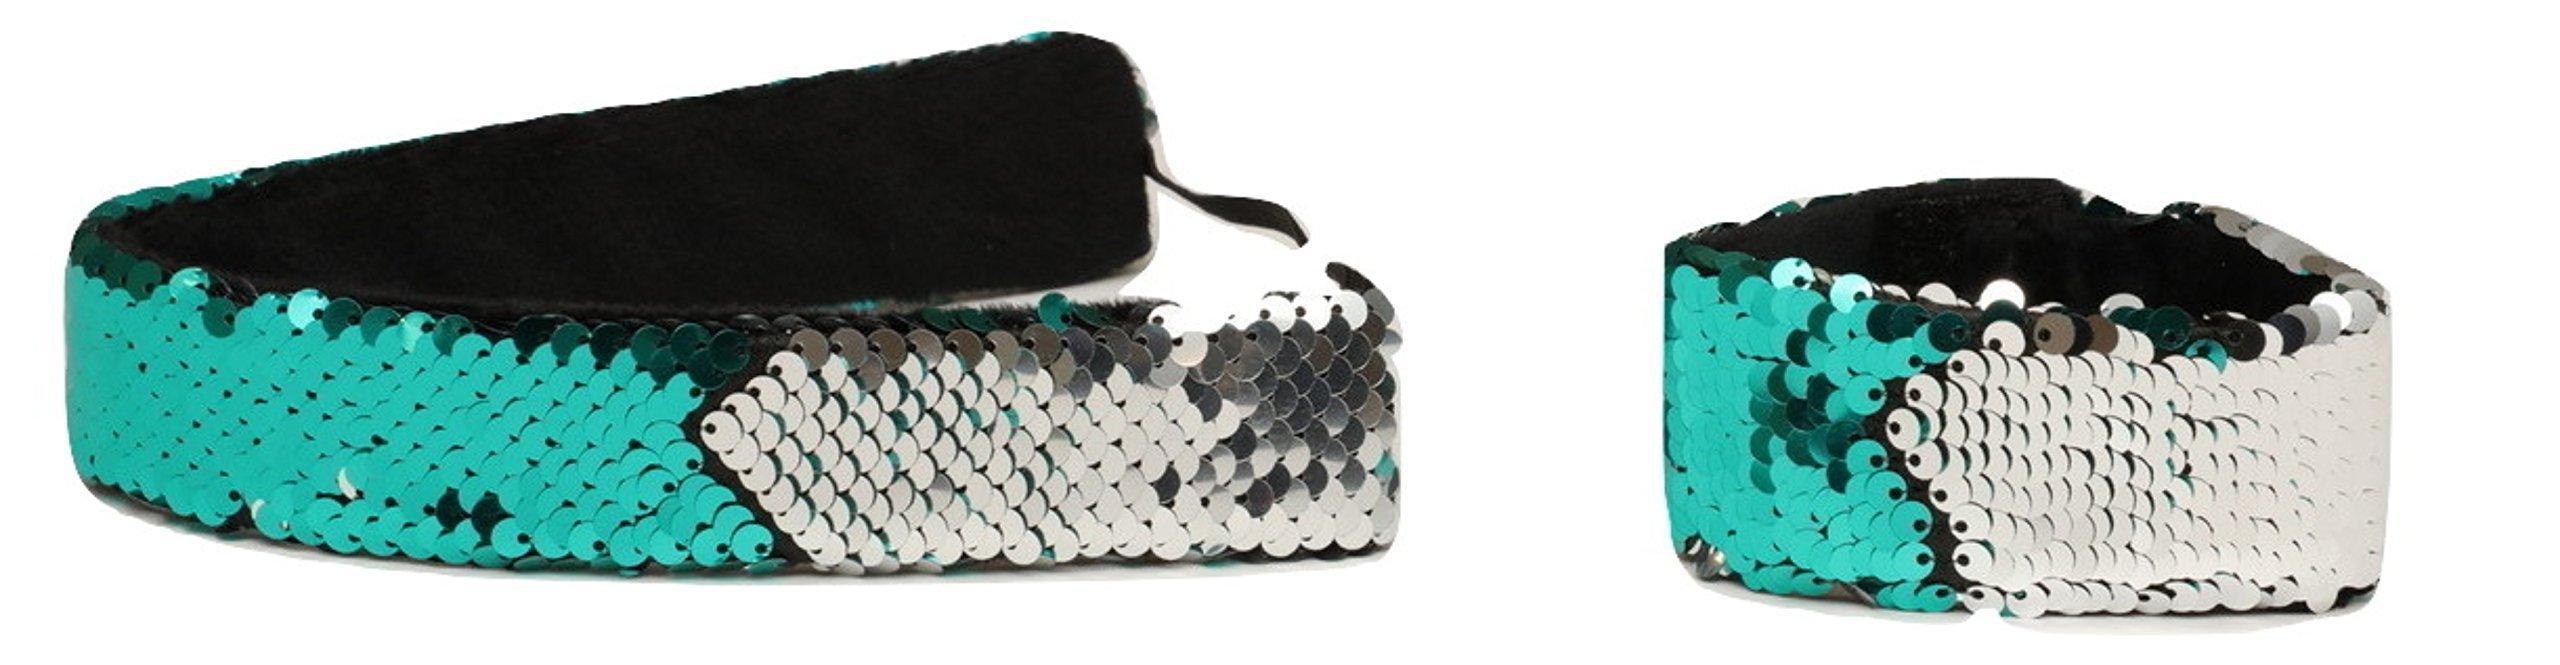 Sparklee Me Mermaid Sequin Headband & Bracelet Sea Green/Silver 2 Pack